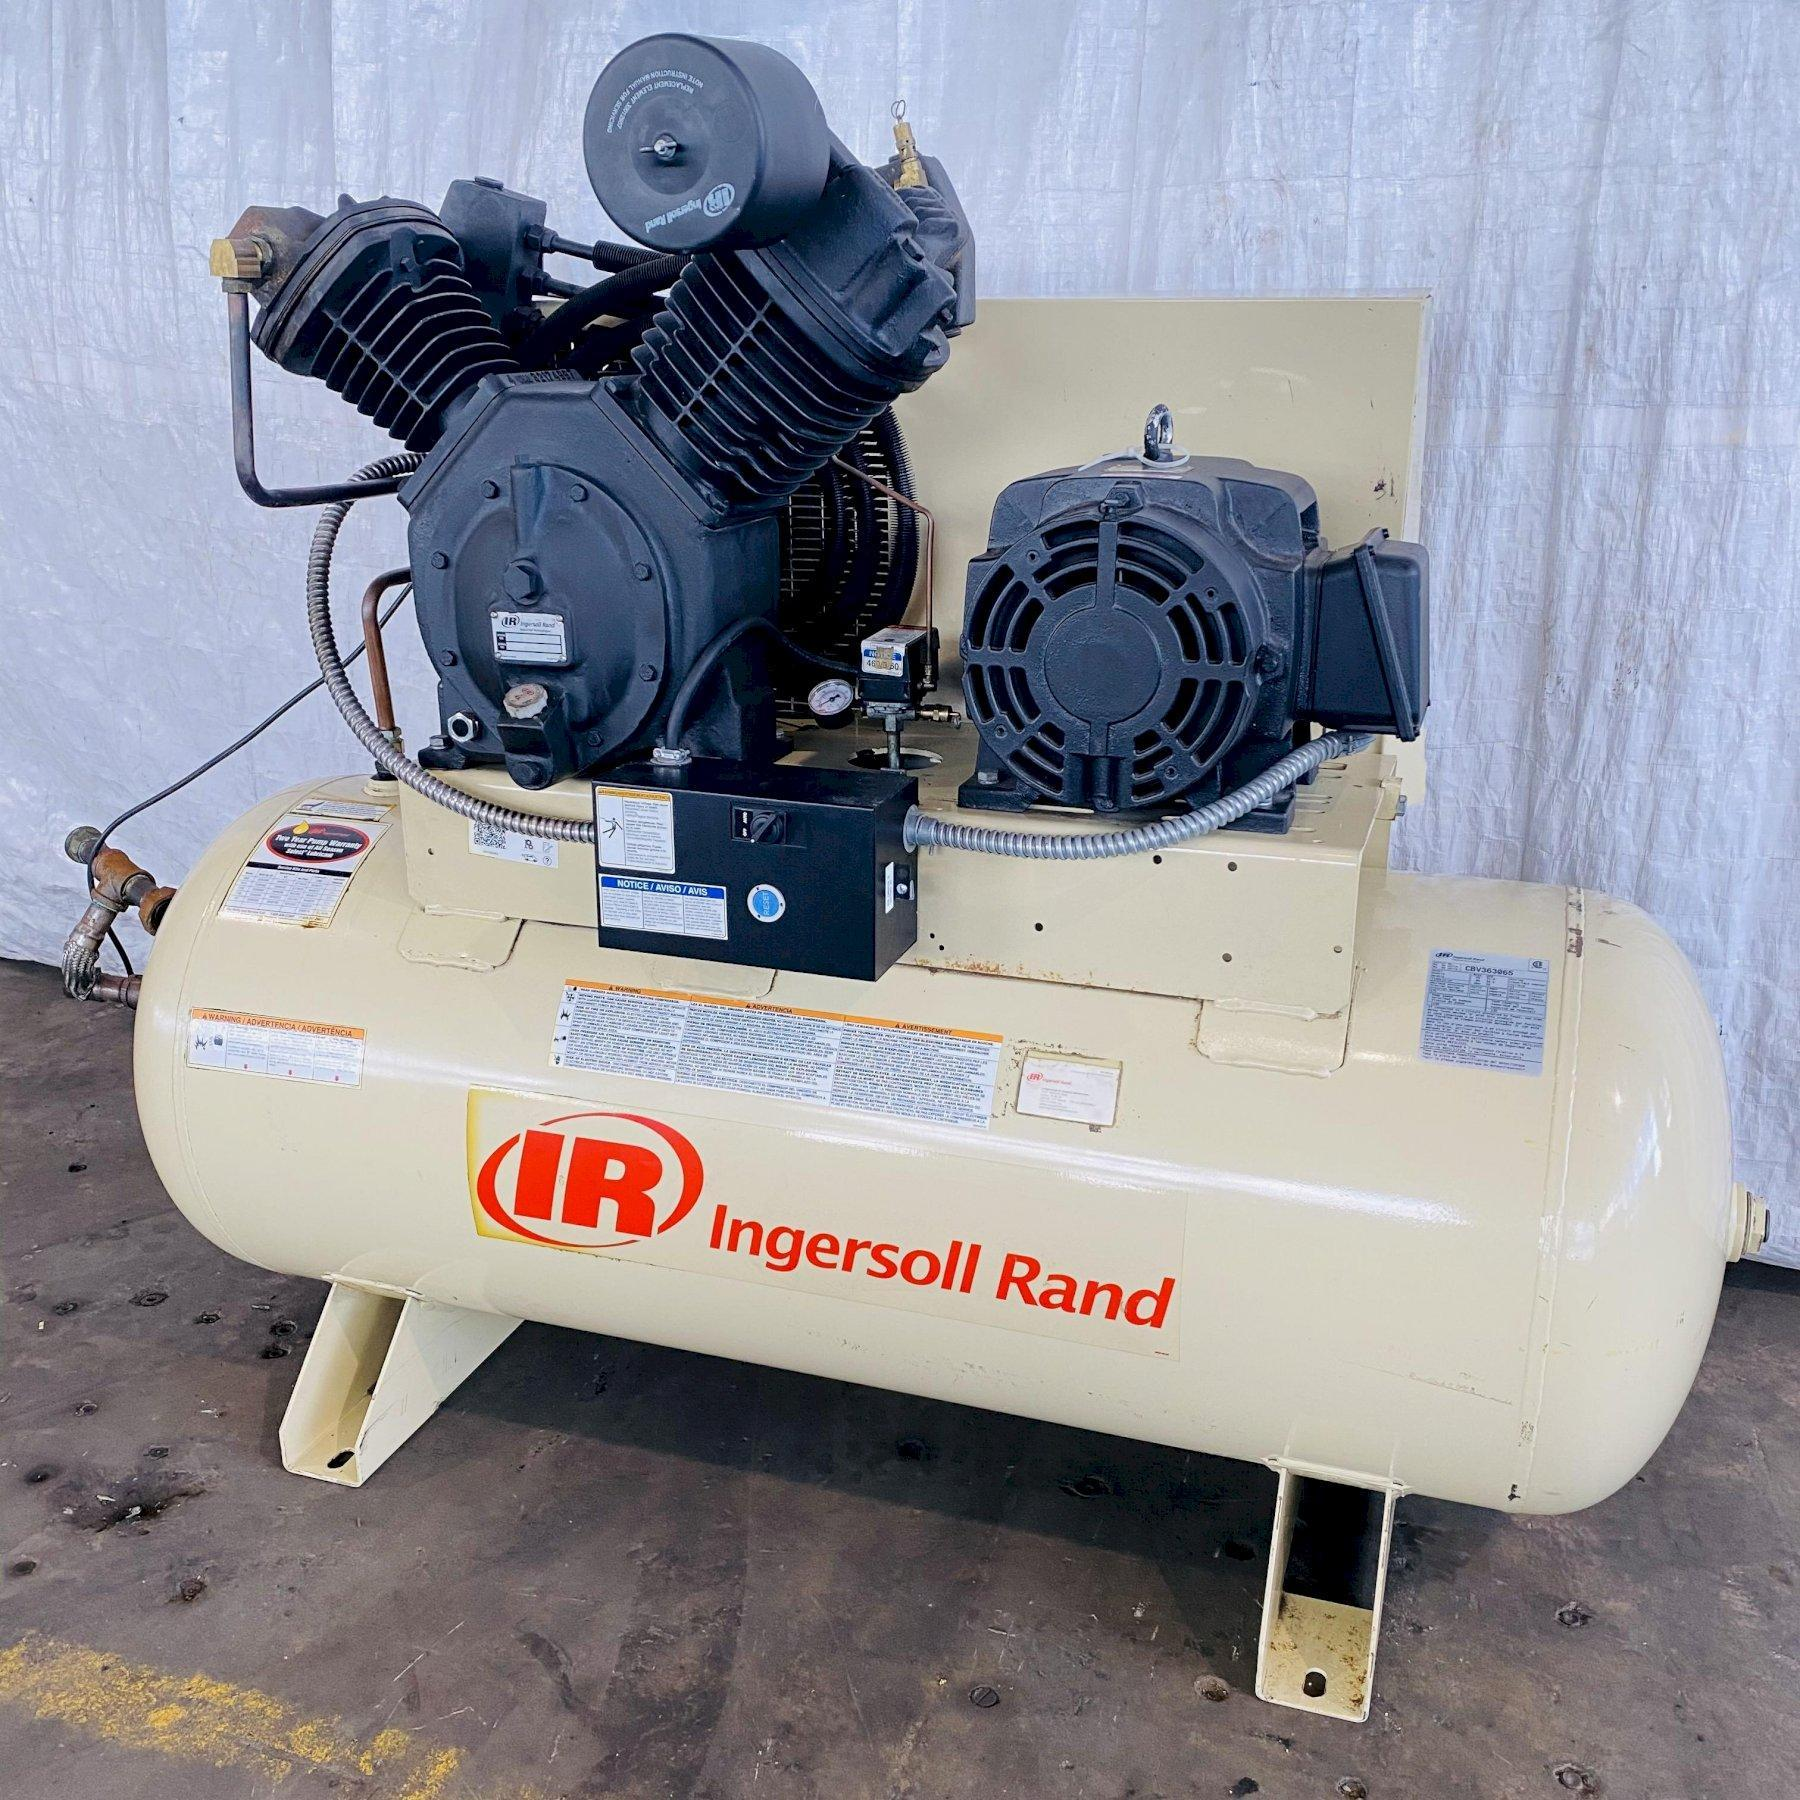 15 HP INGERSOLL-RAND 7100E15-VP HORIZONTAL PISTON TYPE AIR COMPRESSOR. STOCK # 0631621